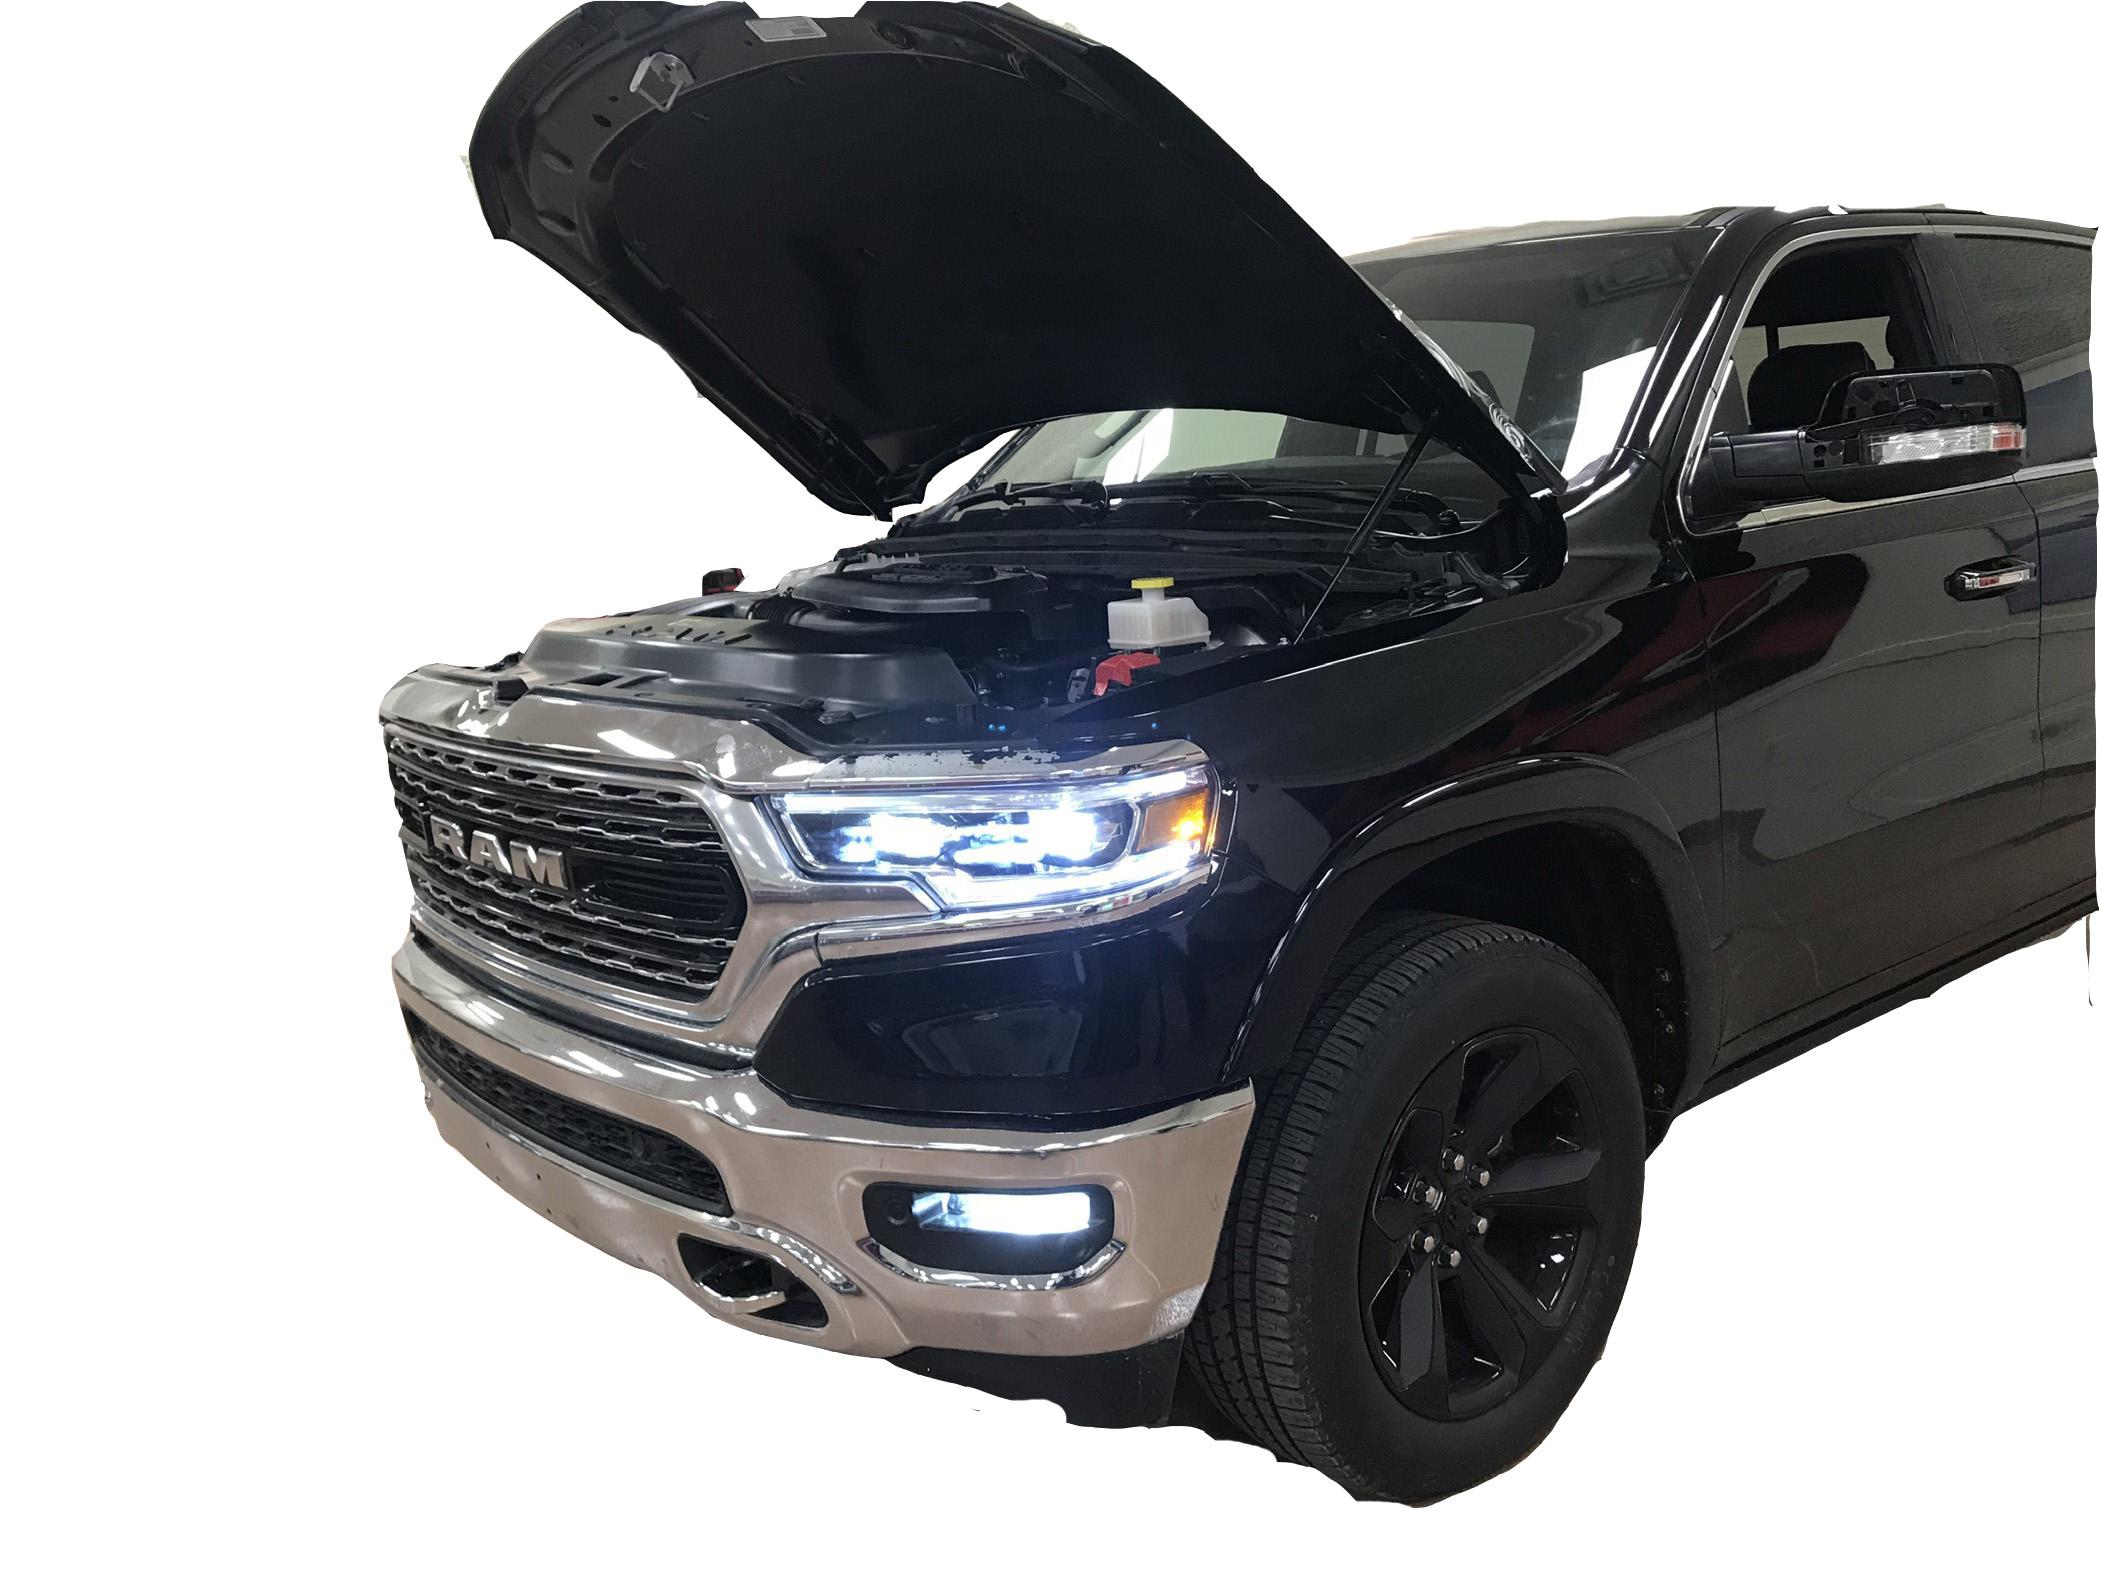 Ecodiesel >> First Look 2019 Ram 1500 Limited Ecodiesel V6 Mopar Insiders